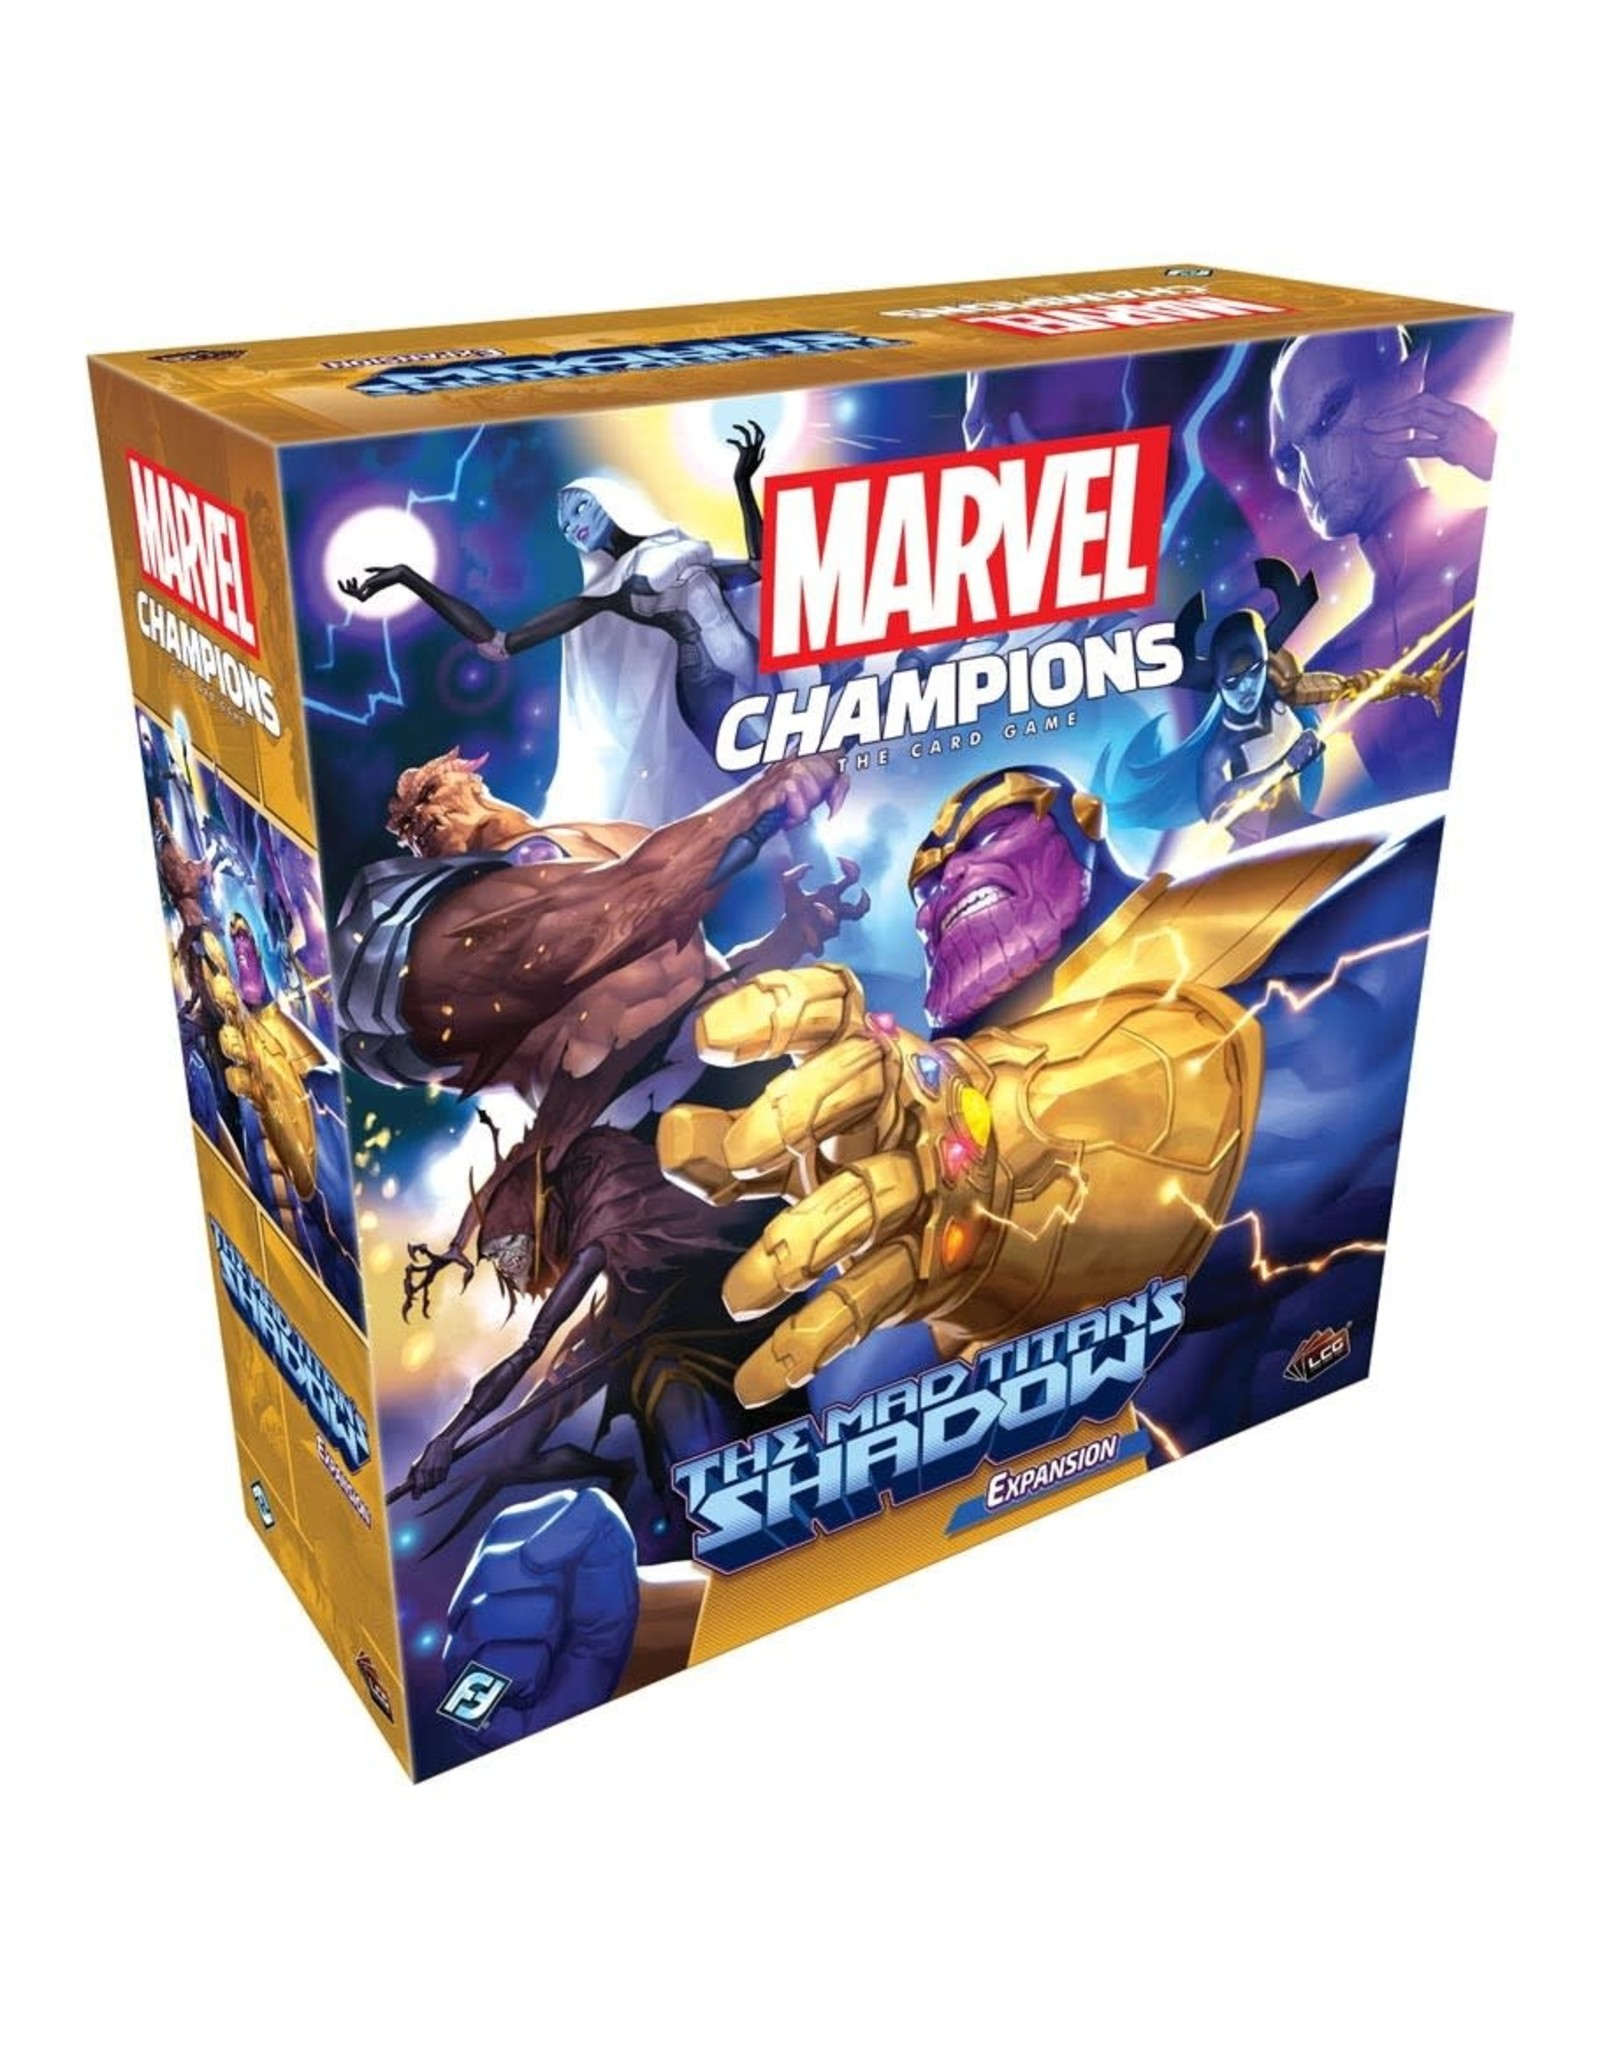 Fantasy Flight Games PREORDER: The Mad Titan's Shadow - Marvel Champions LCG